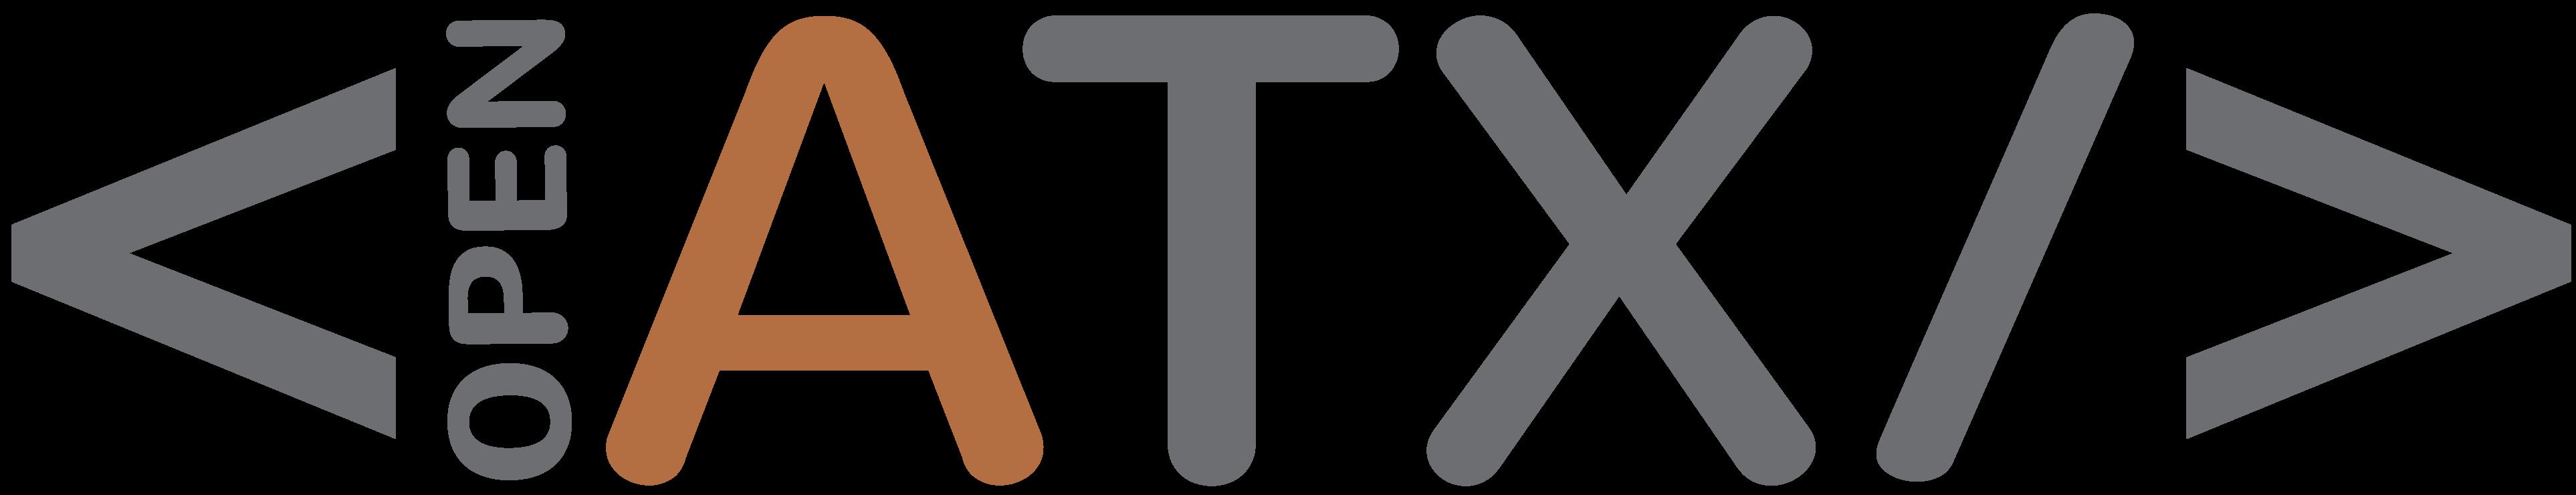 Open Austin logo